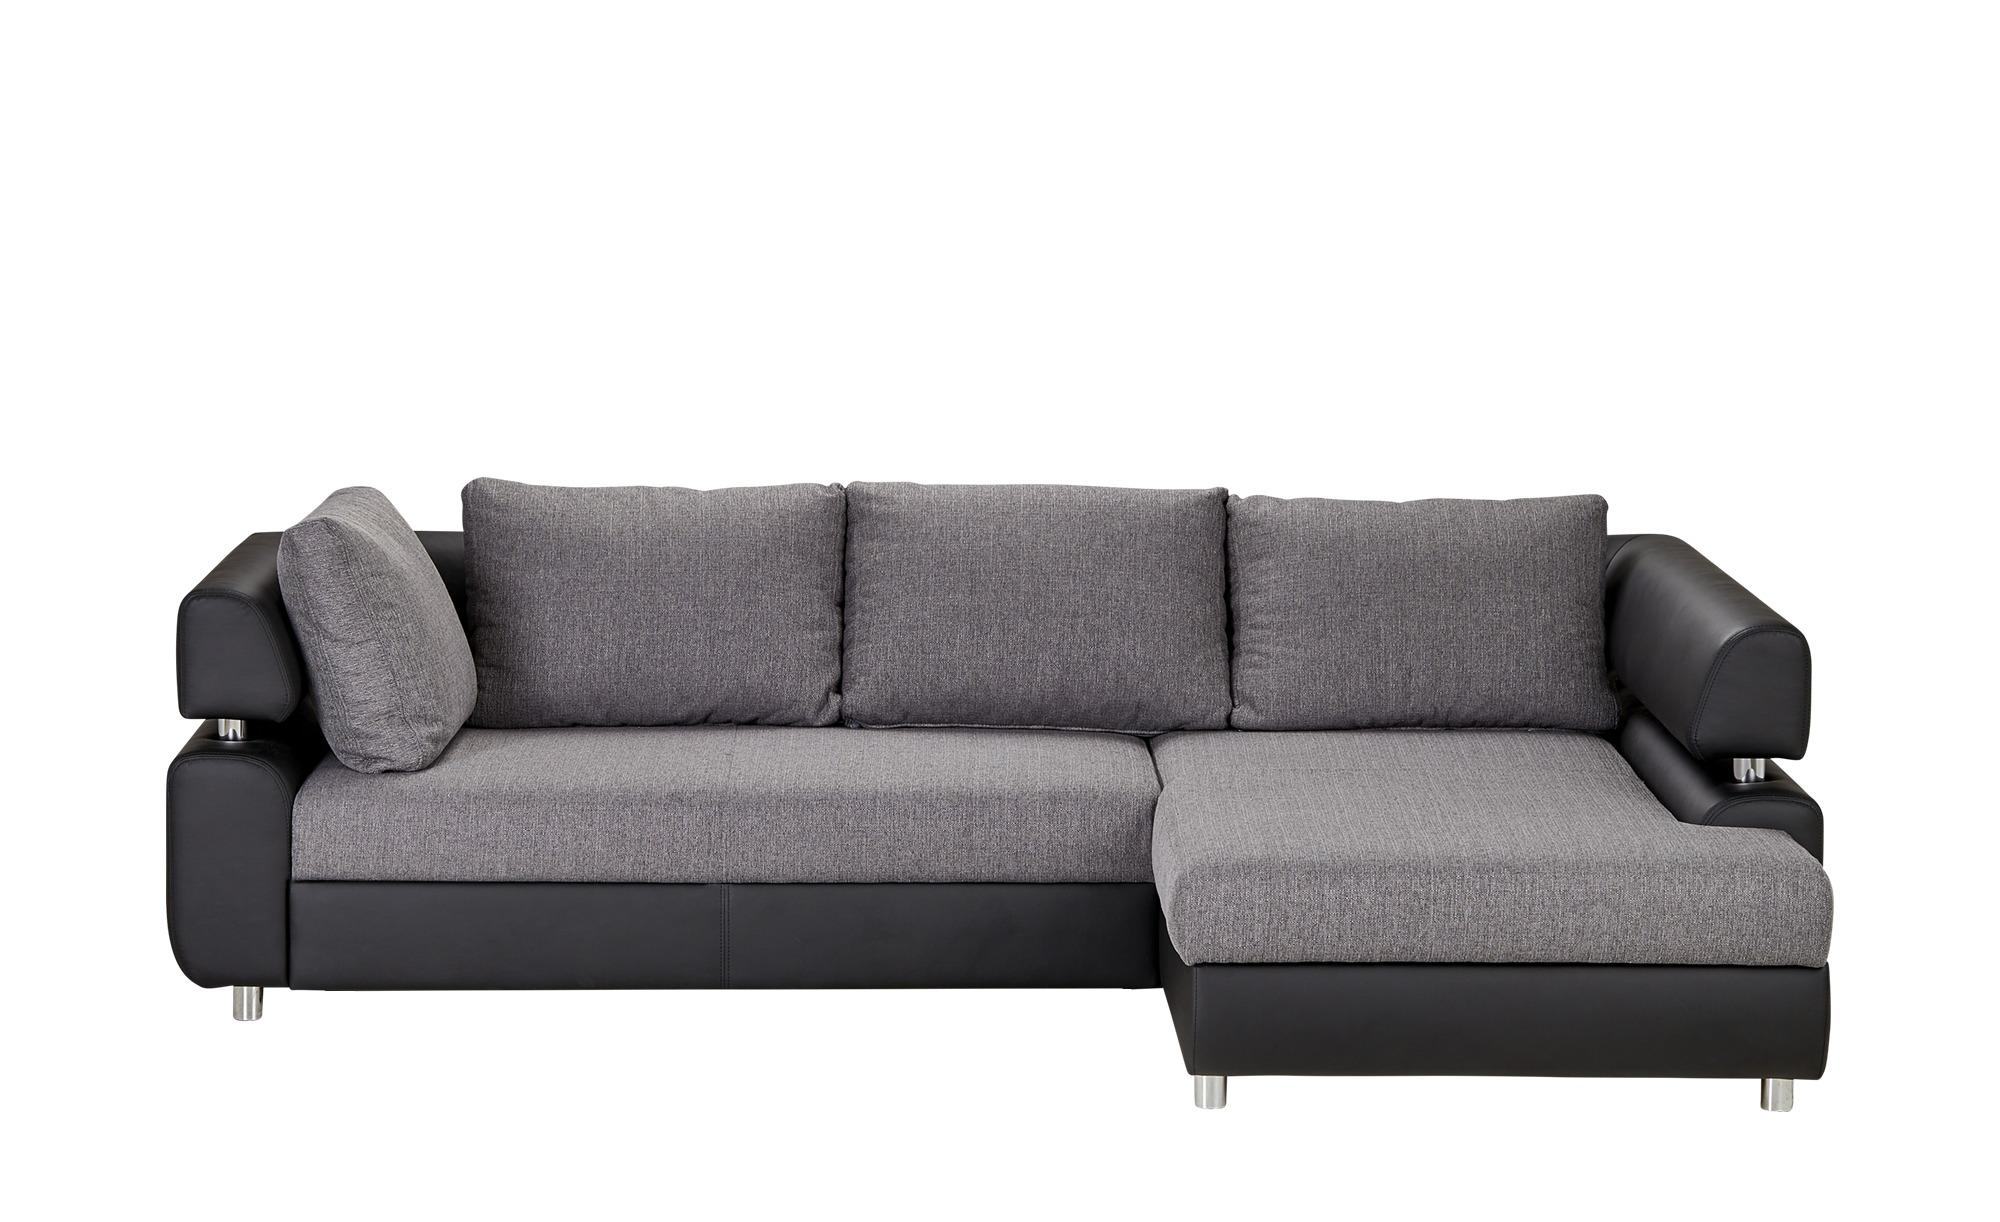 Switch Ecksofa Schwarz Grau Kunstleder Webstoff Panama Grau Masse Cm H 84 Polstermobel Sofas Ecksofas Hoffner Ecksofa Moderne Couch Und Sofa Leder